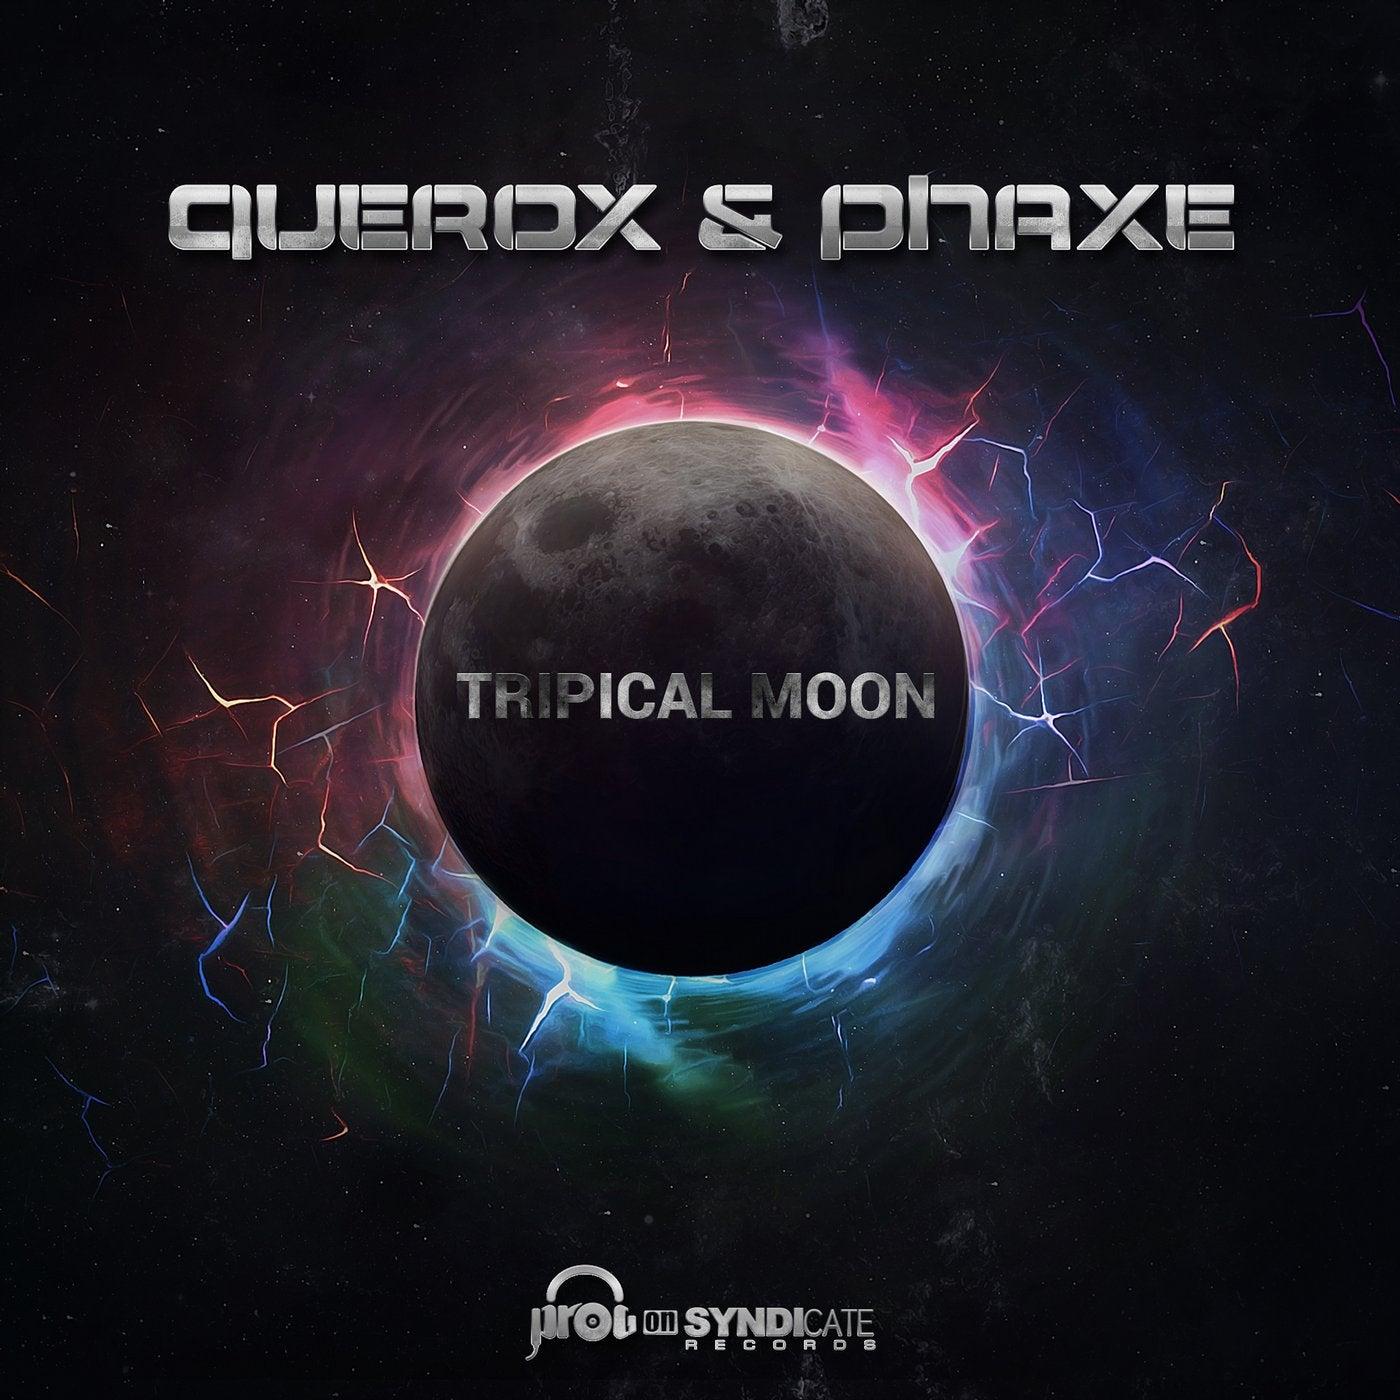 Tripical Moon (Original Mix)